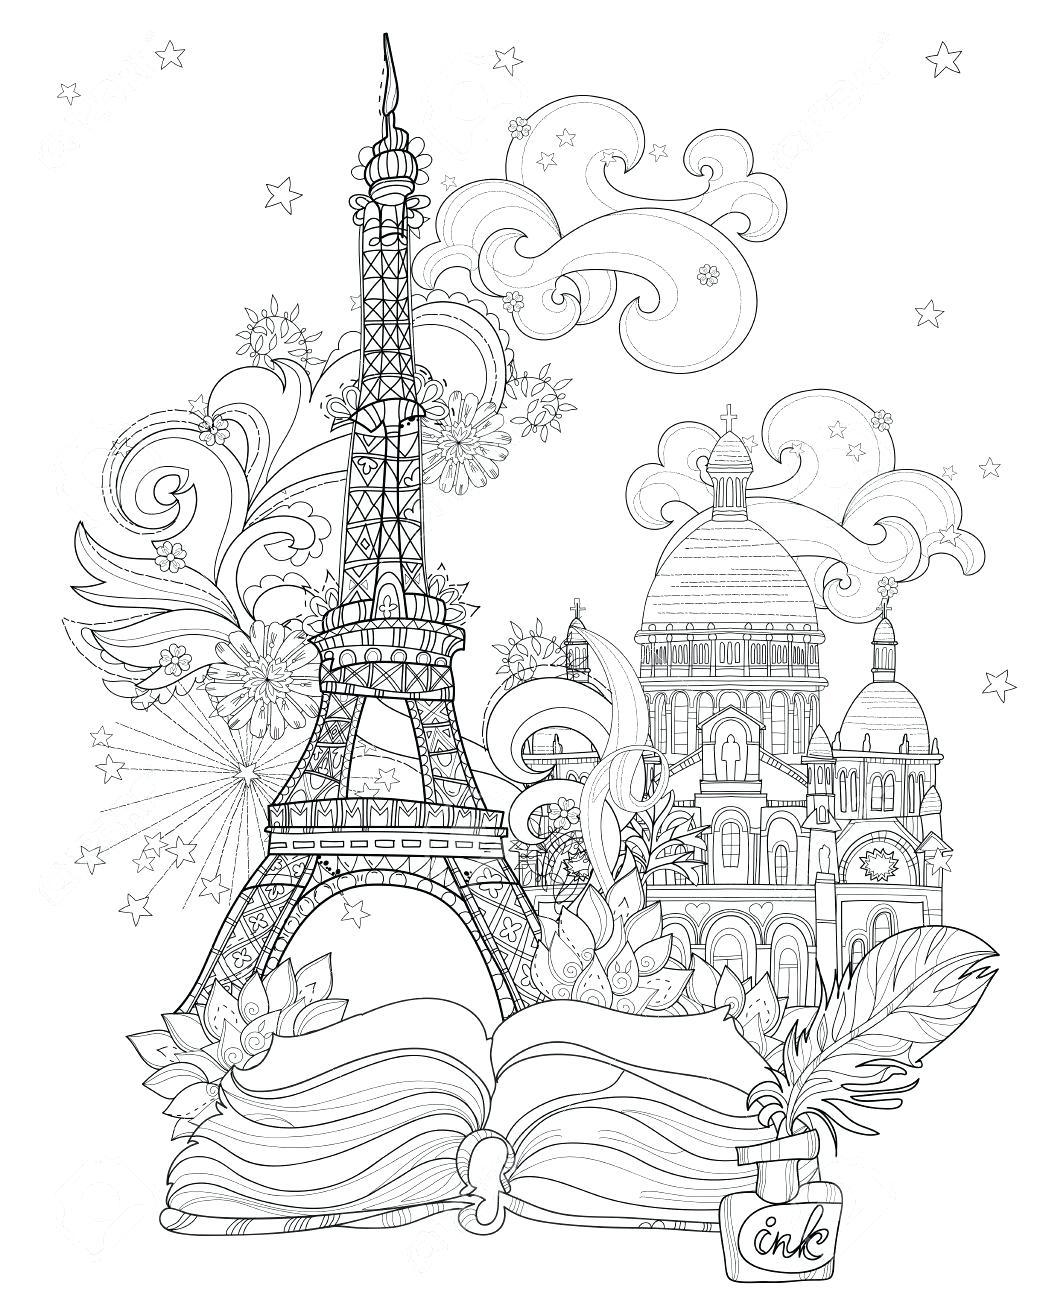 1040x1300 Coloring Eiffel Tower Coloring Page Paris Printable Pages. Eiffel